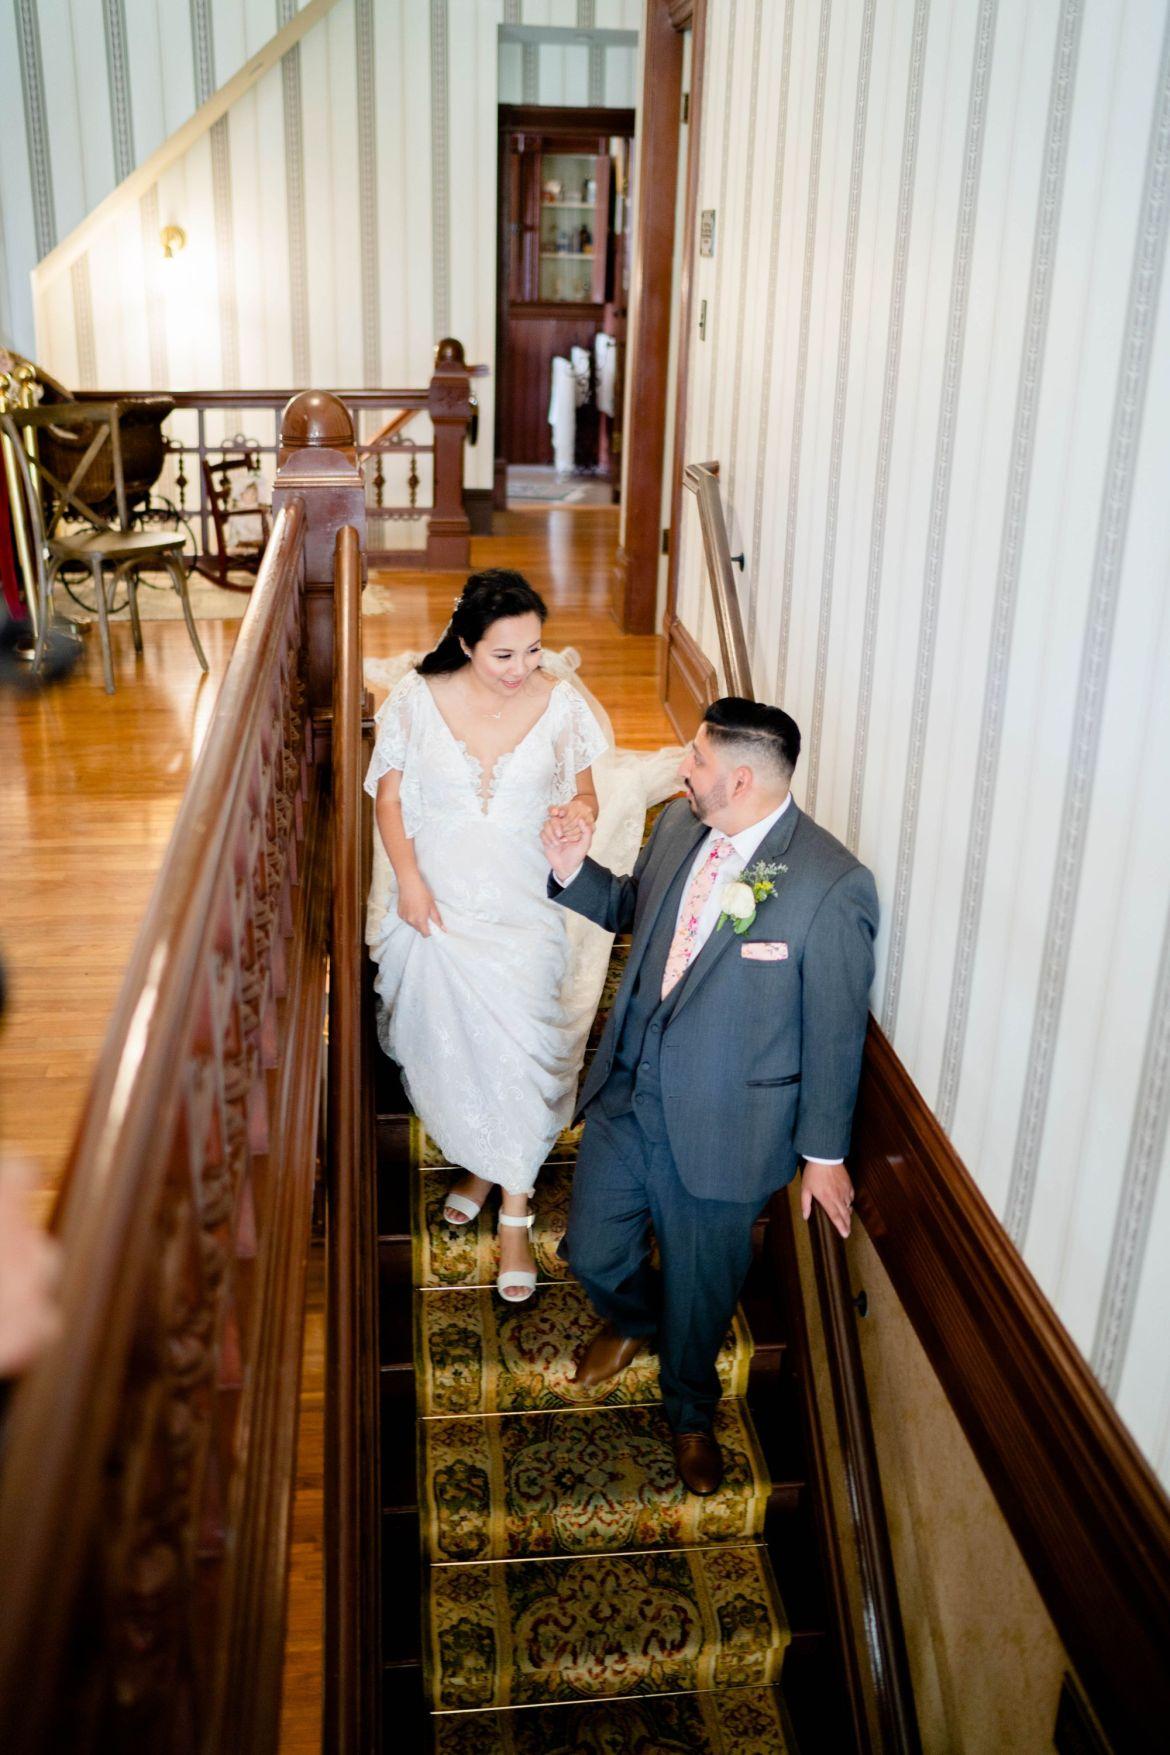 wedding at historical house